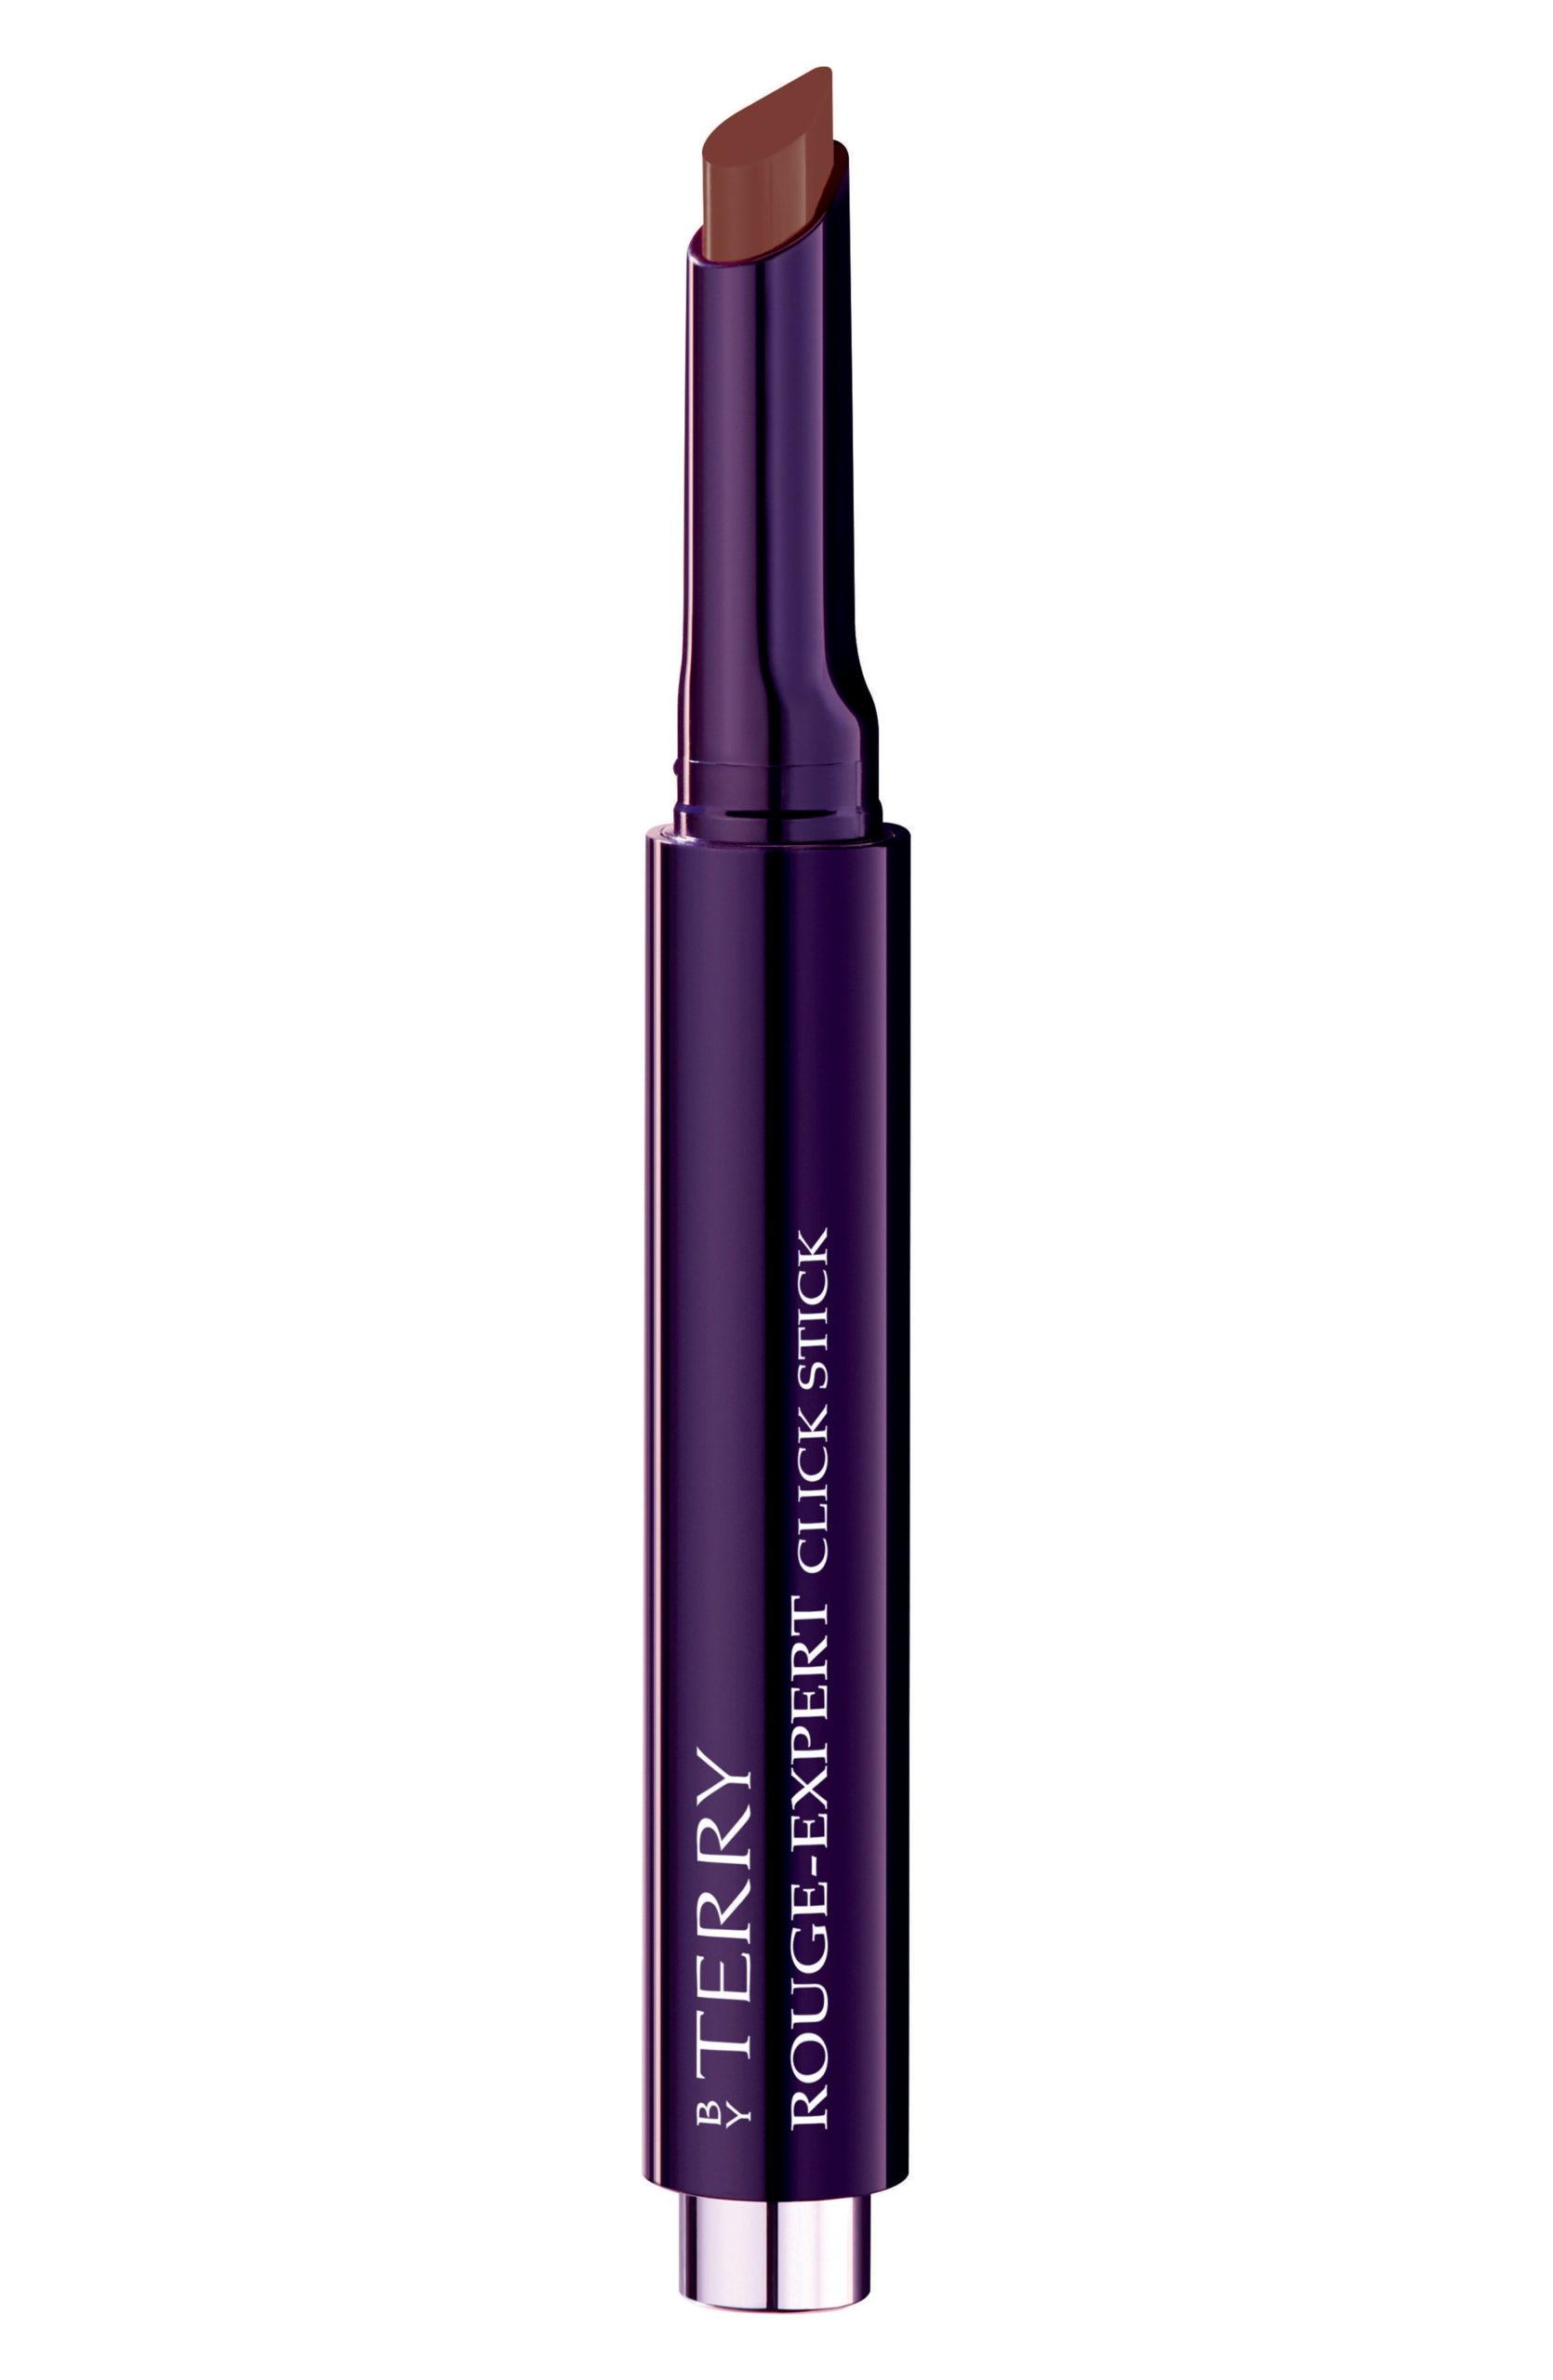 Rouge Expert Click Stick Lipstick - 26 Choco Chic